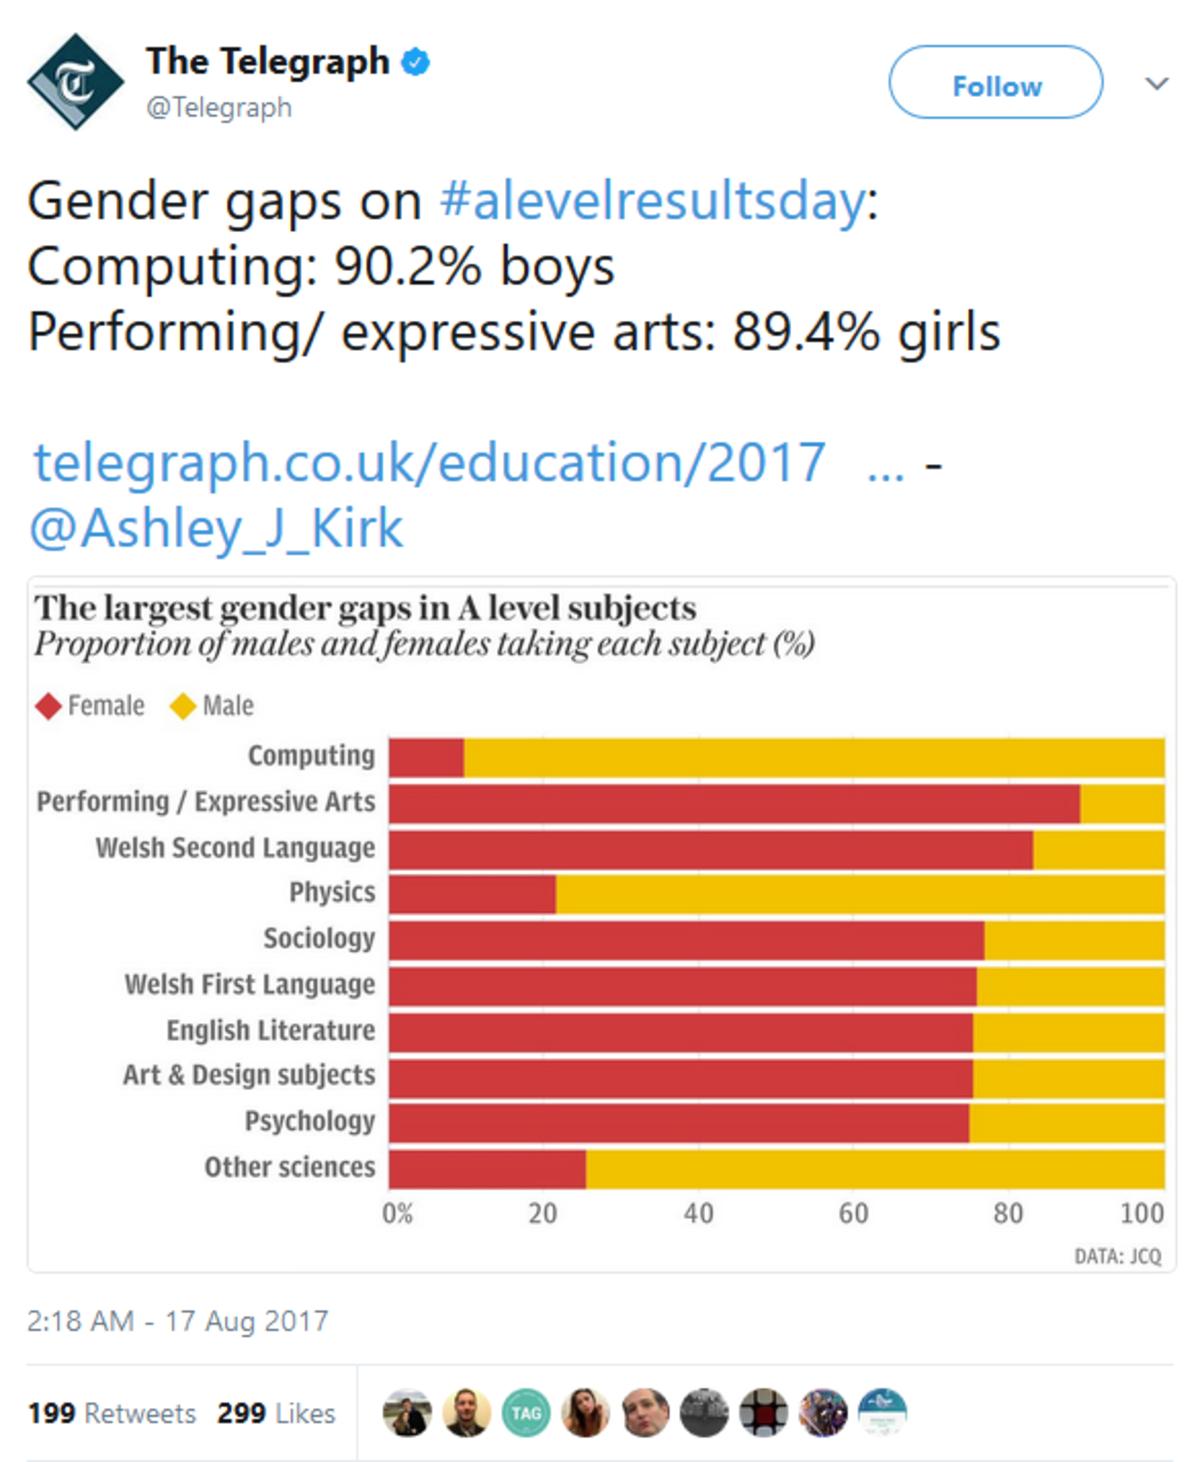 Girls love having the gap. . The Telegraph', (Cr/ aw])) if ii) Telegraph ('Codwaw]), Gender gaps on #: Computing: 90. 2% boys Performing/ expressive arts: 89. 4 Girls love having the gap The Telegraph' (Cr/ aw])) if ii) Telegraph ('Codwaw]) Gender gaps on #: Computing: 90 2% boys Performing/ expressive arts: 89 4